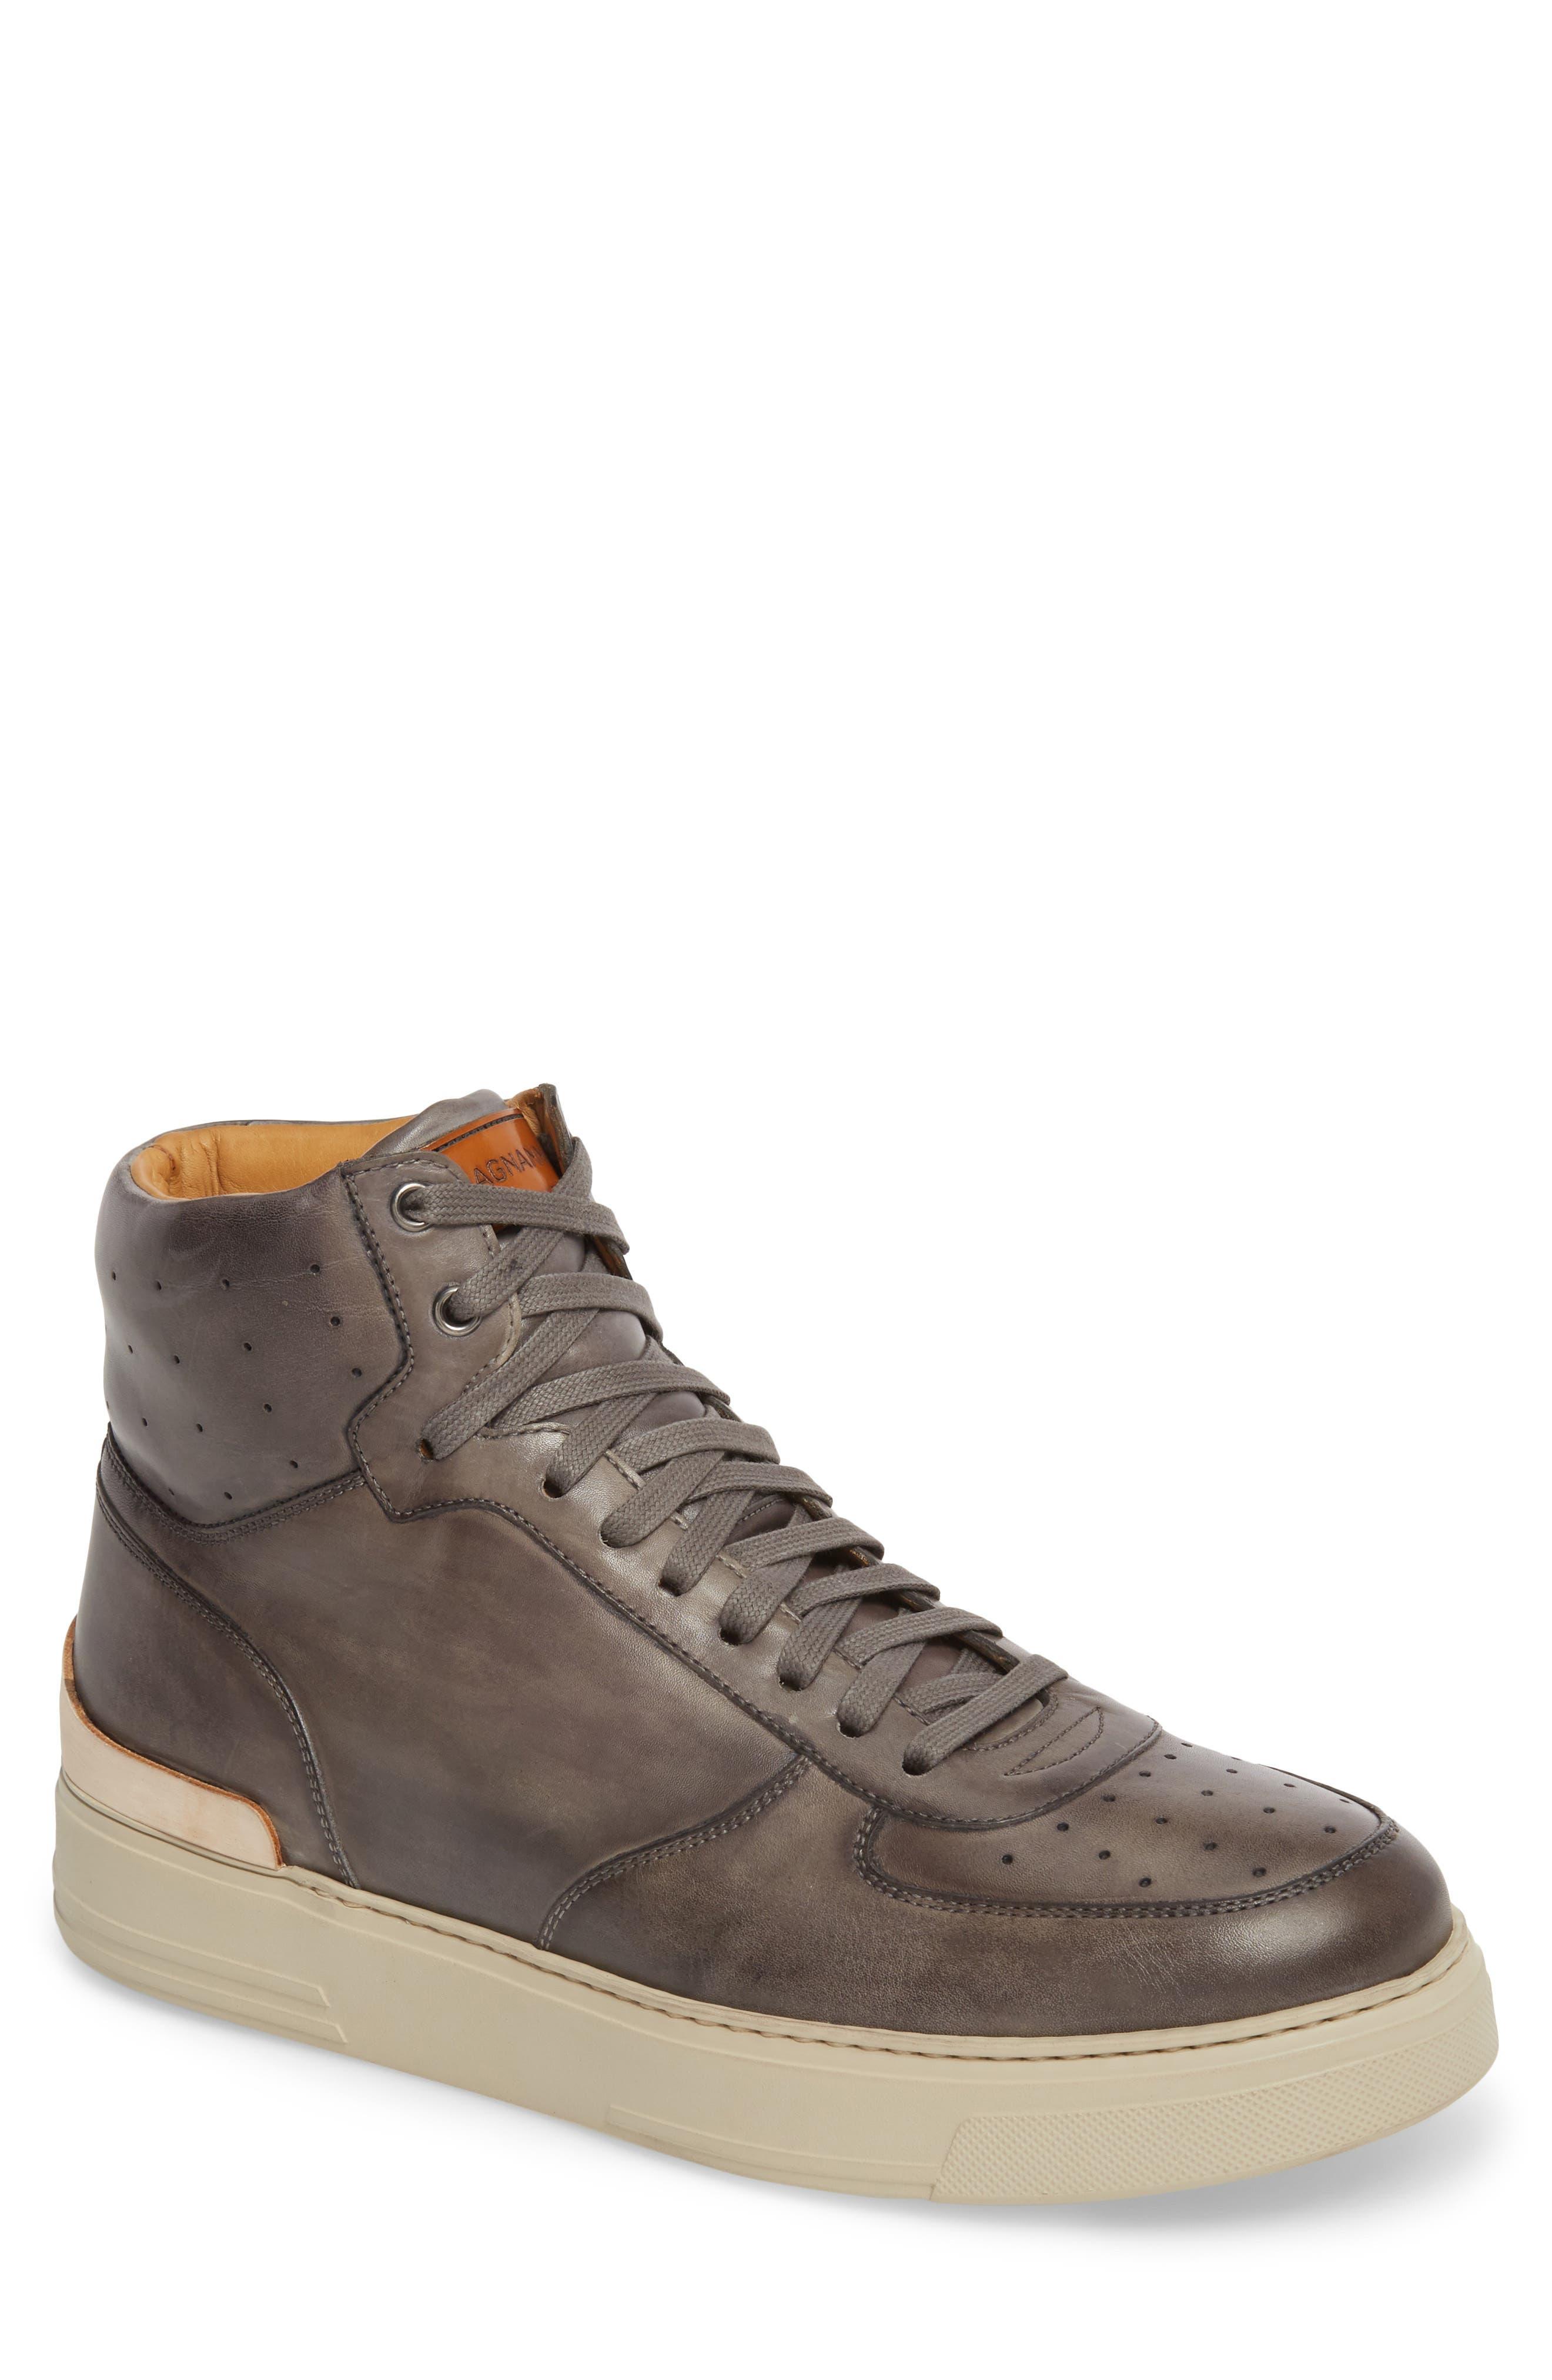 Varro Hi Top Lace Up Sneaker,                             Main thumbnail 1, color,                             Grey/ Grey Leather